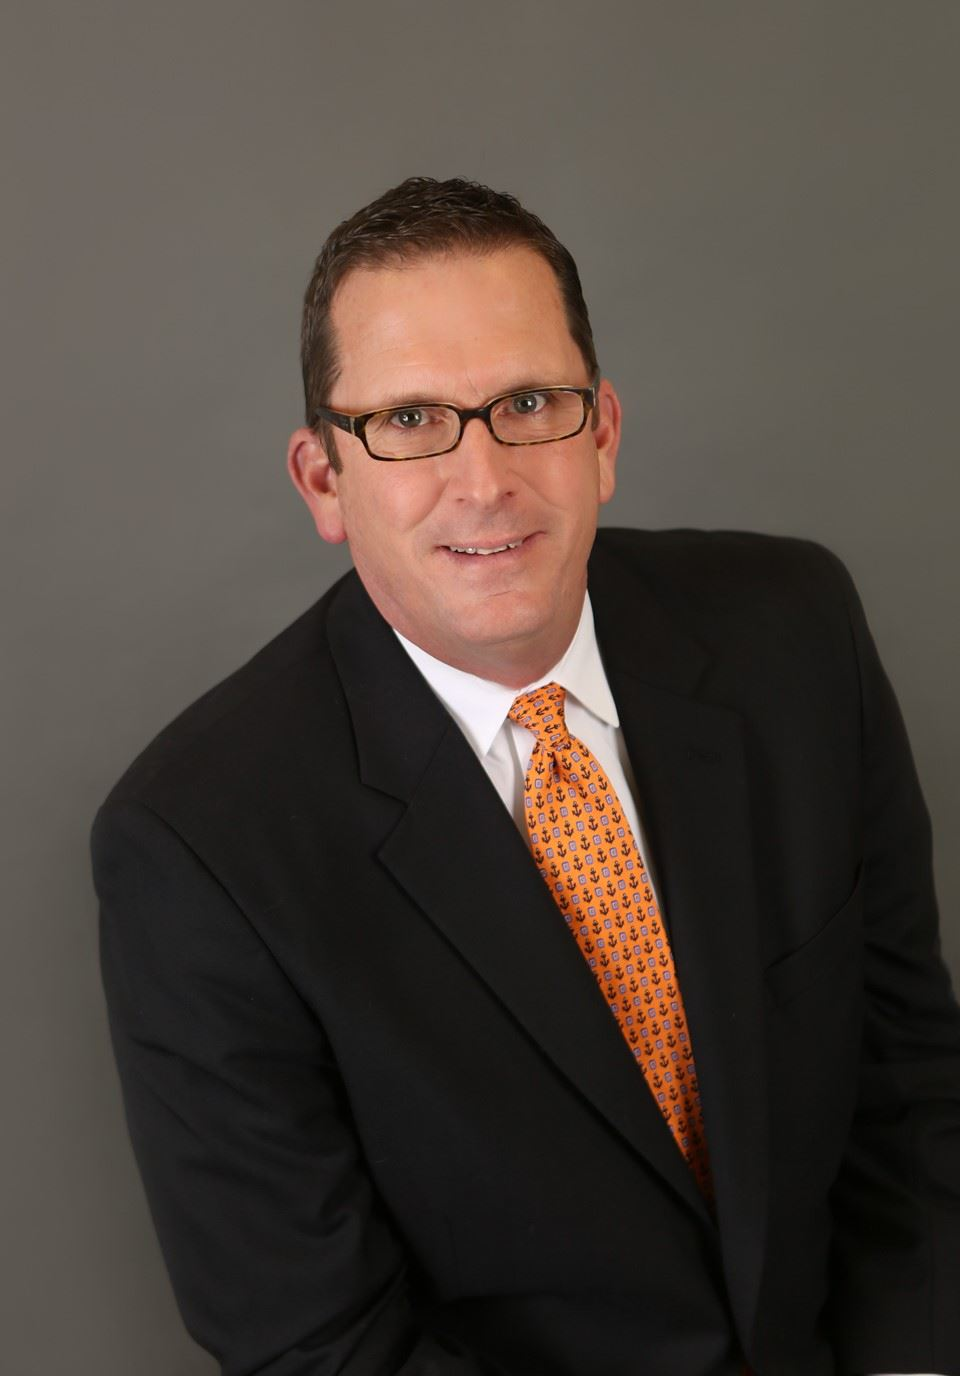 Trussville Rotary Daybreak Club announces 'leadership expert' as next speaker